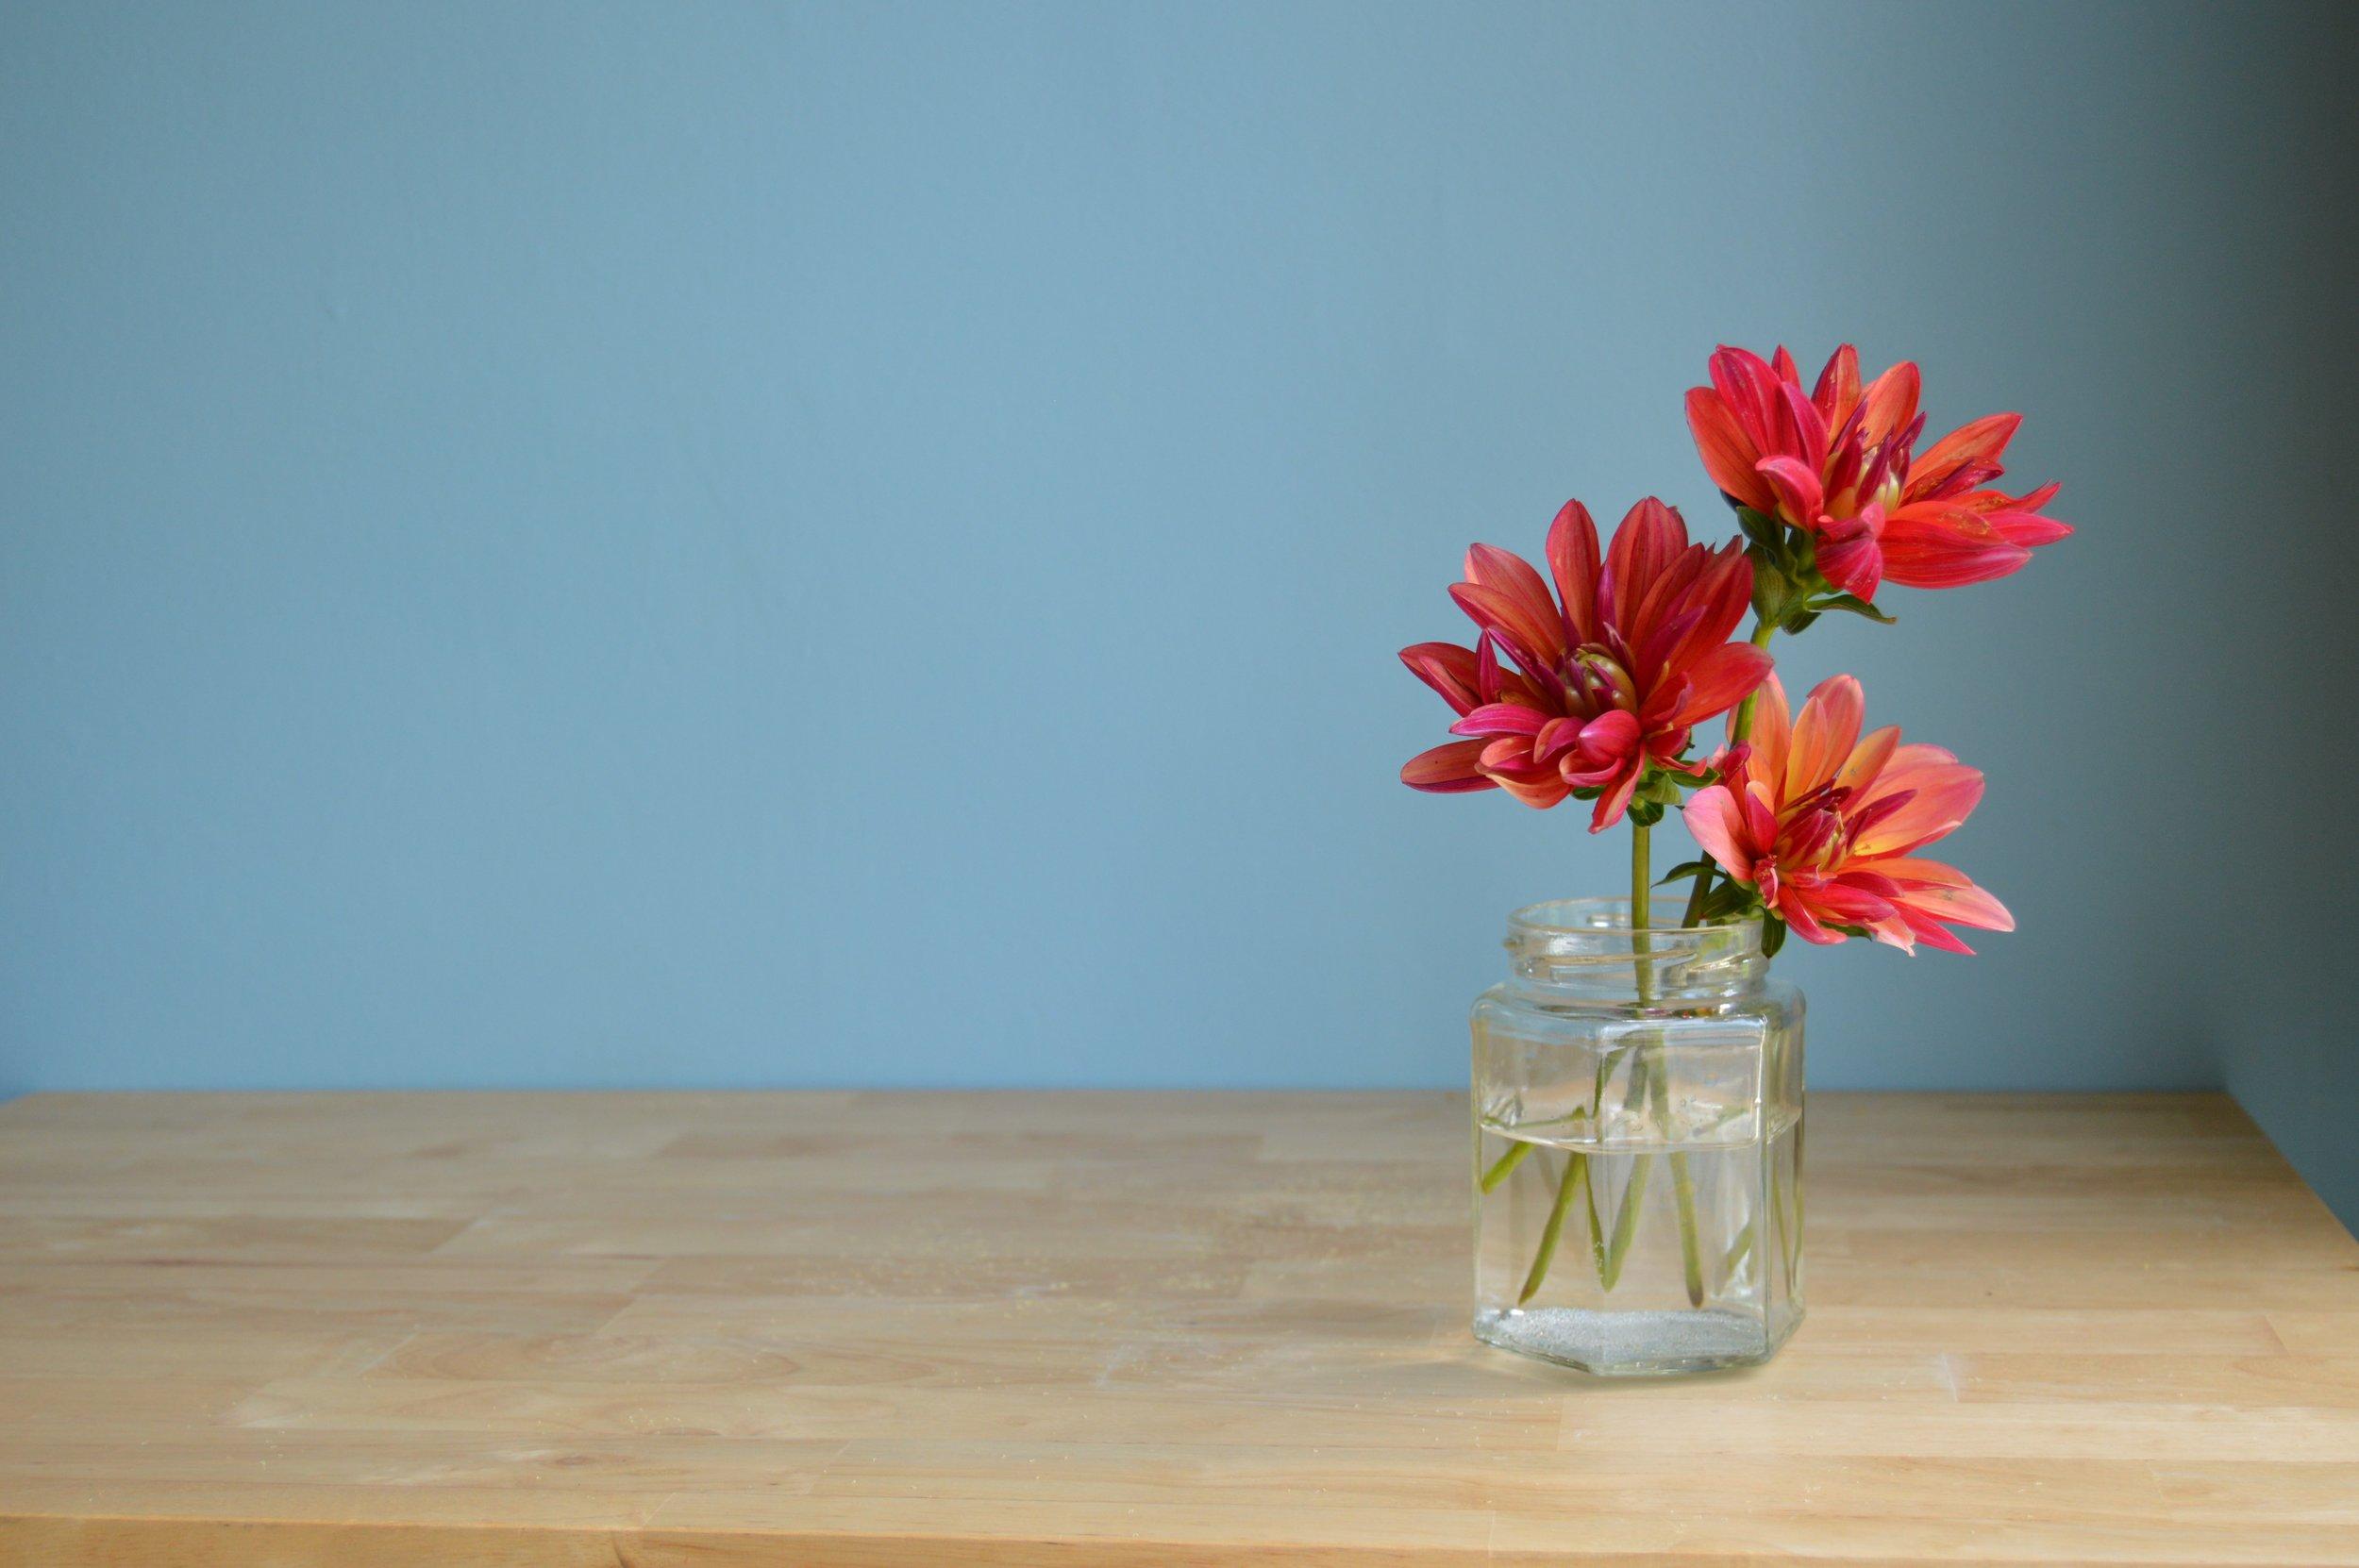 Flower Shop! - Our services:Customizable SubscriptionsWeddings & Special EventsFarmers Markets